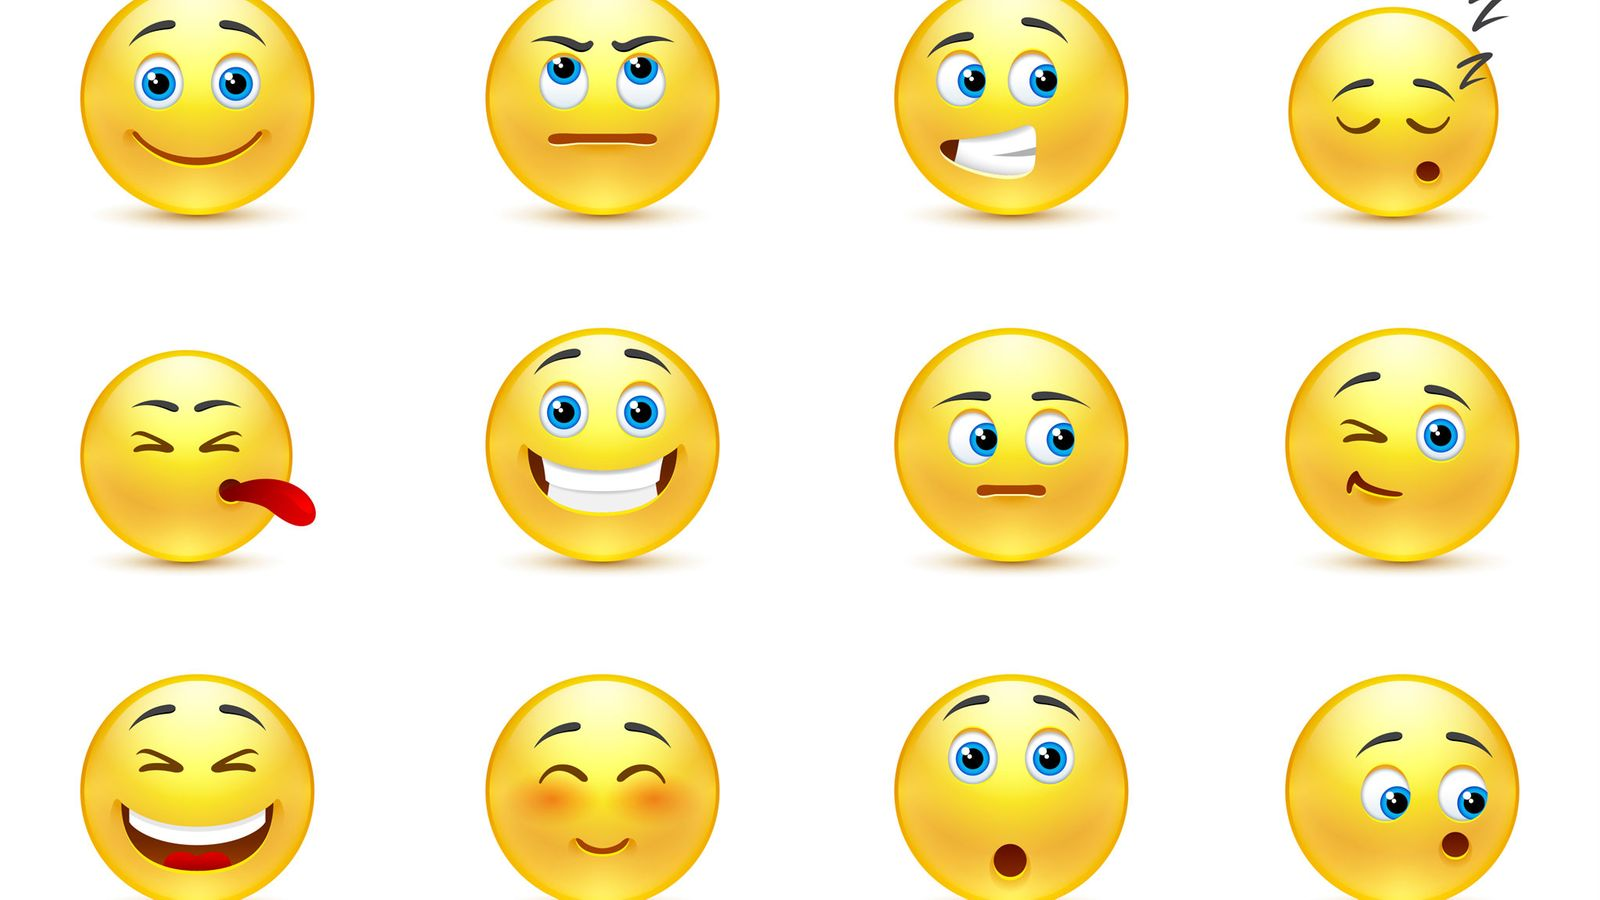 emoji hymiöiden merkitys Kiuruvesi